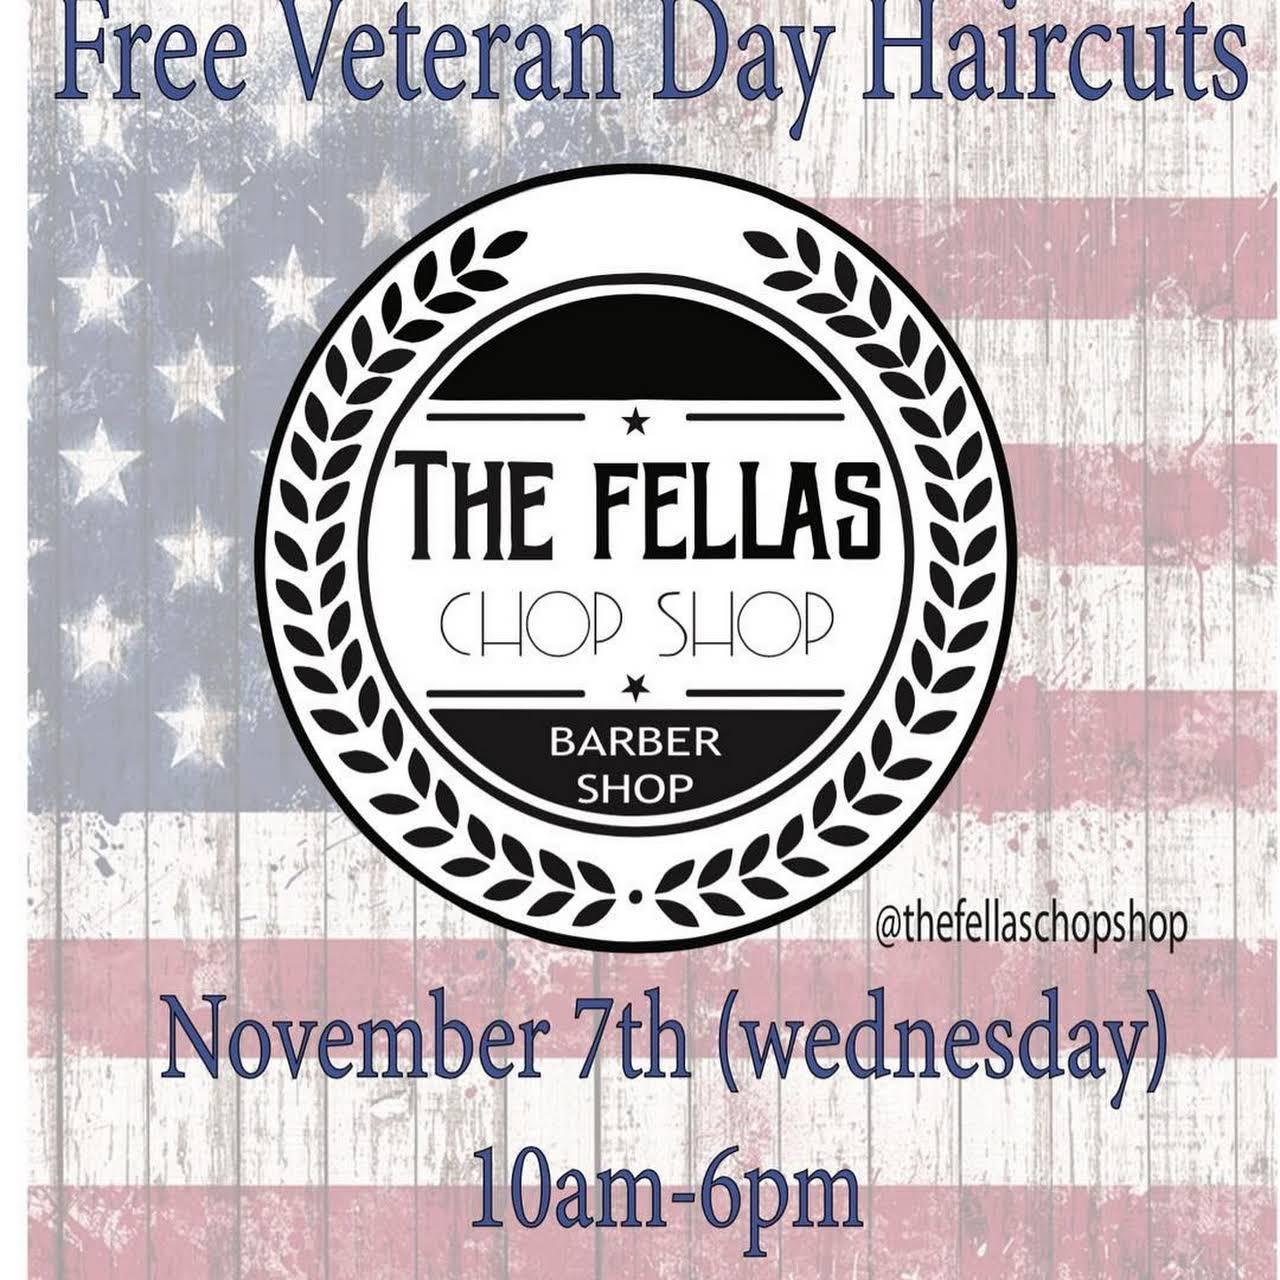 The Fellas Chop Shop - Barber Shop in Spanish Fork